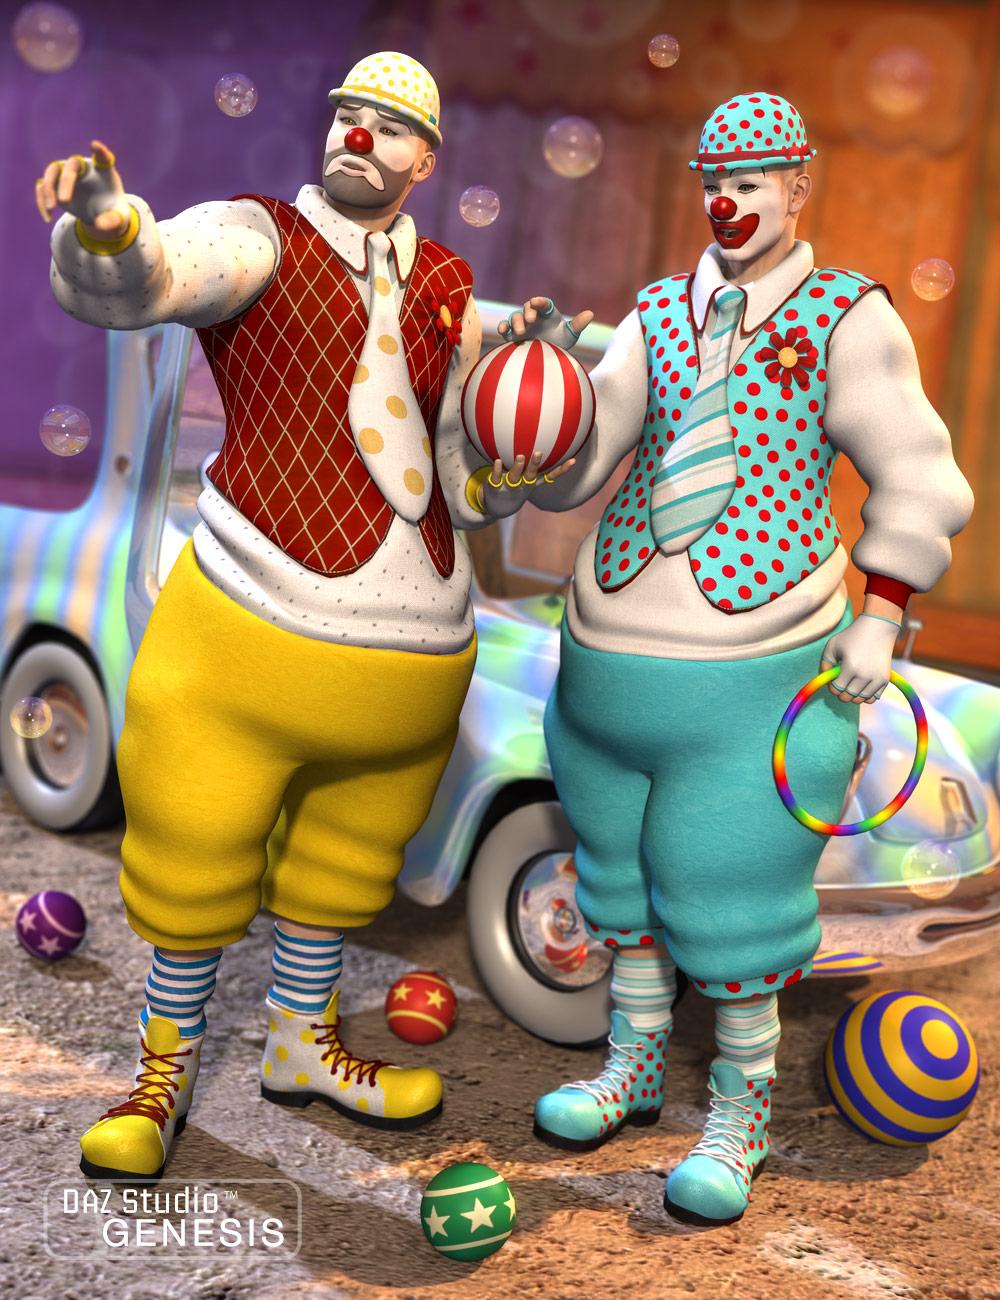 Clown Textures by: Sarsa, 3D Models by Daz 3D